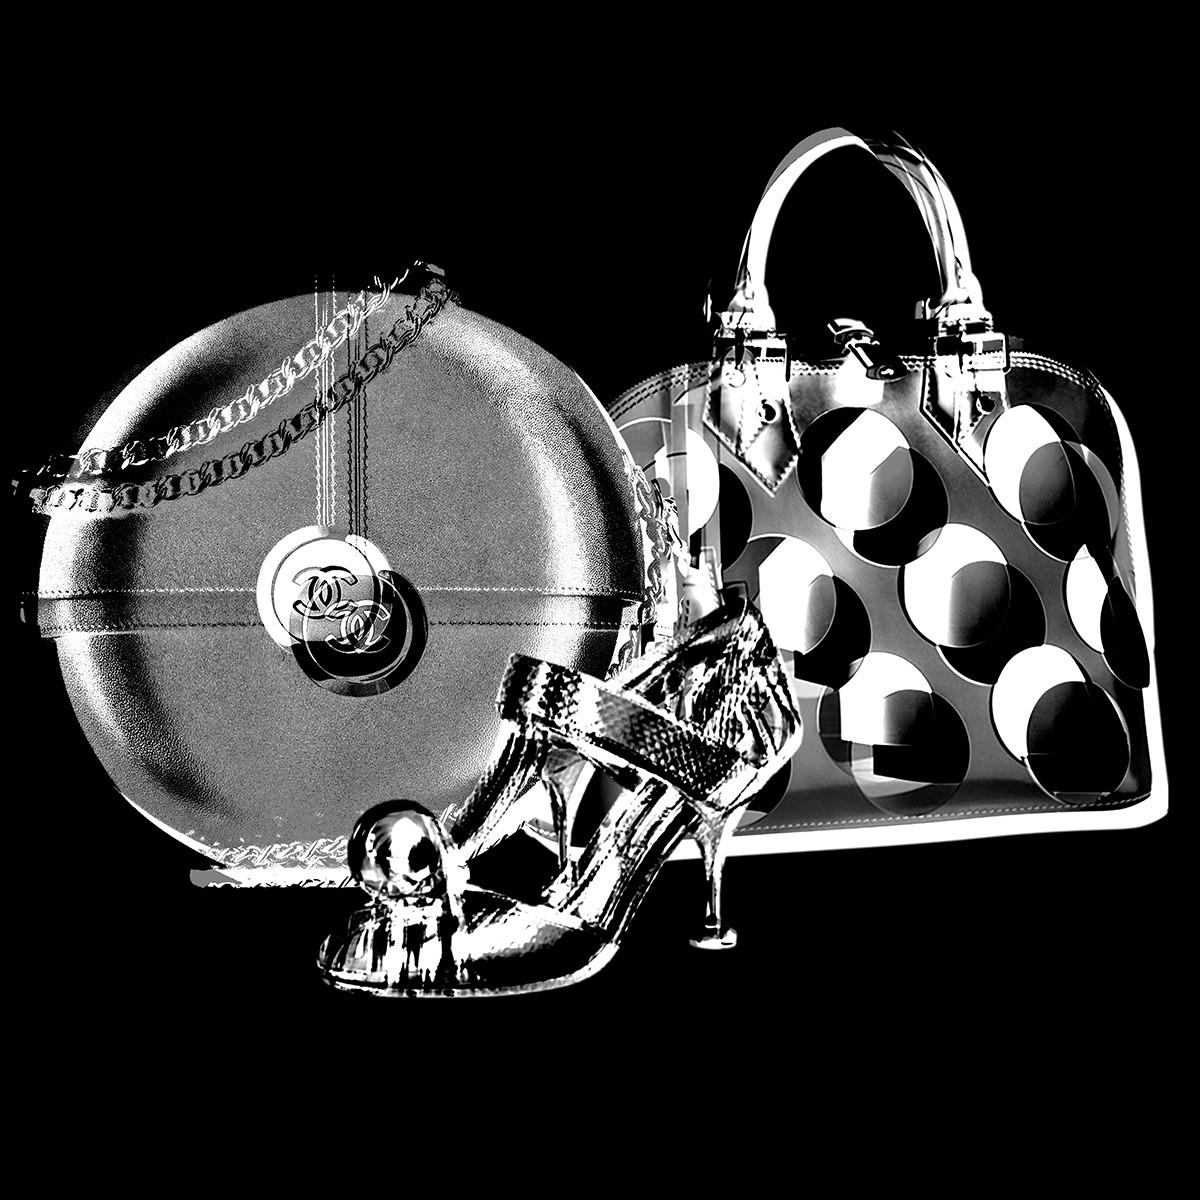 Prada, Louis Vuitton and Chanel's round accessories